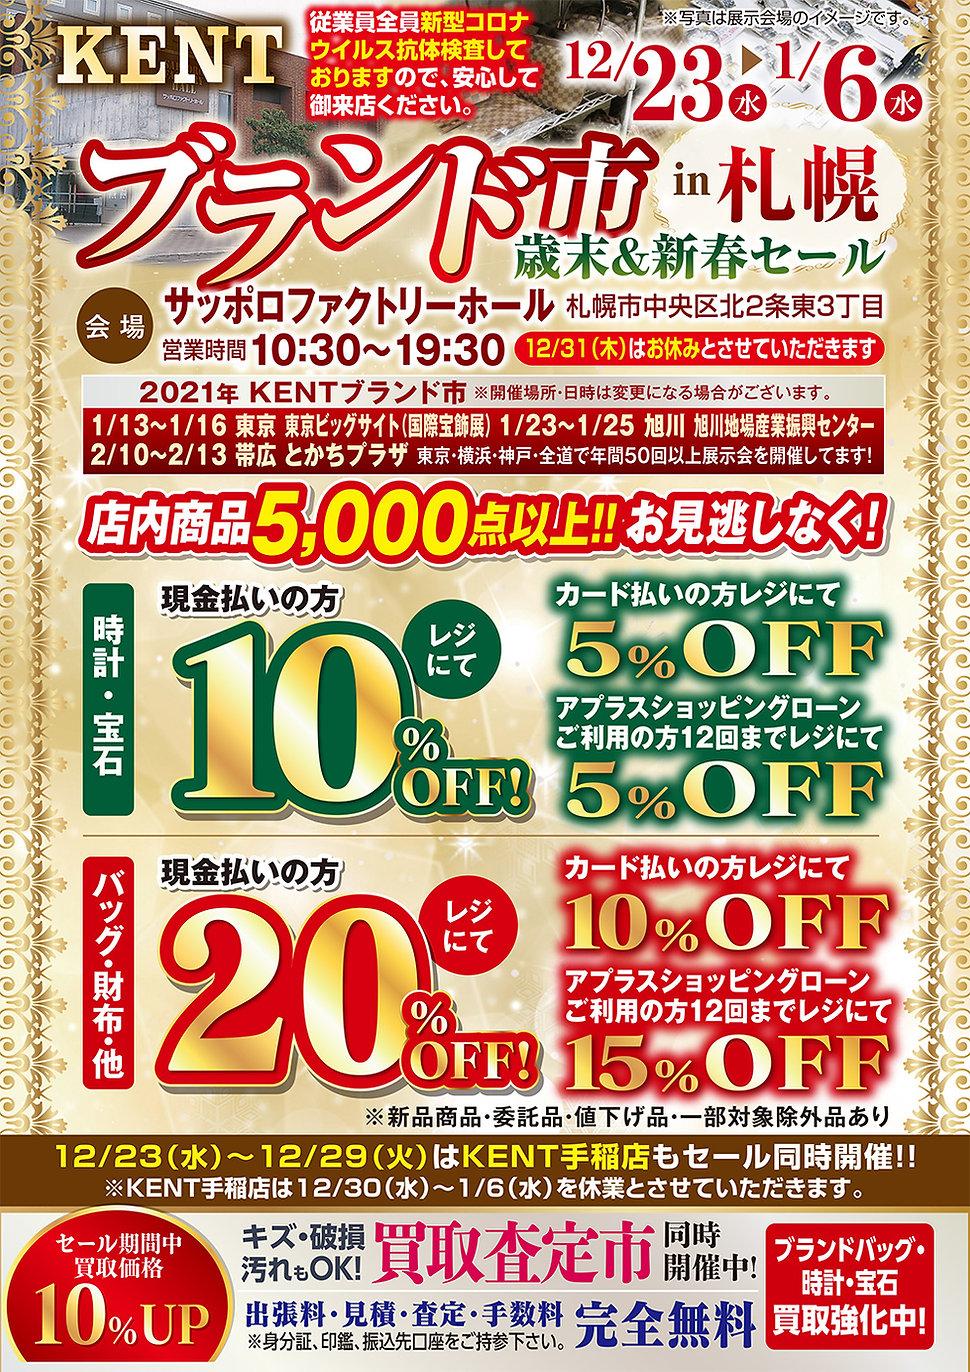 2020_1223KENT札幌-DM.jpg